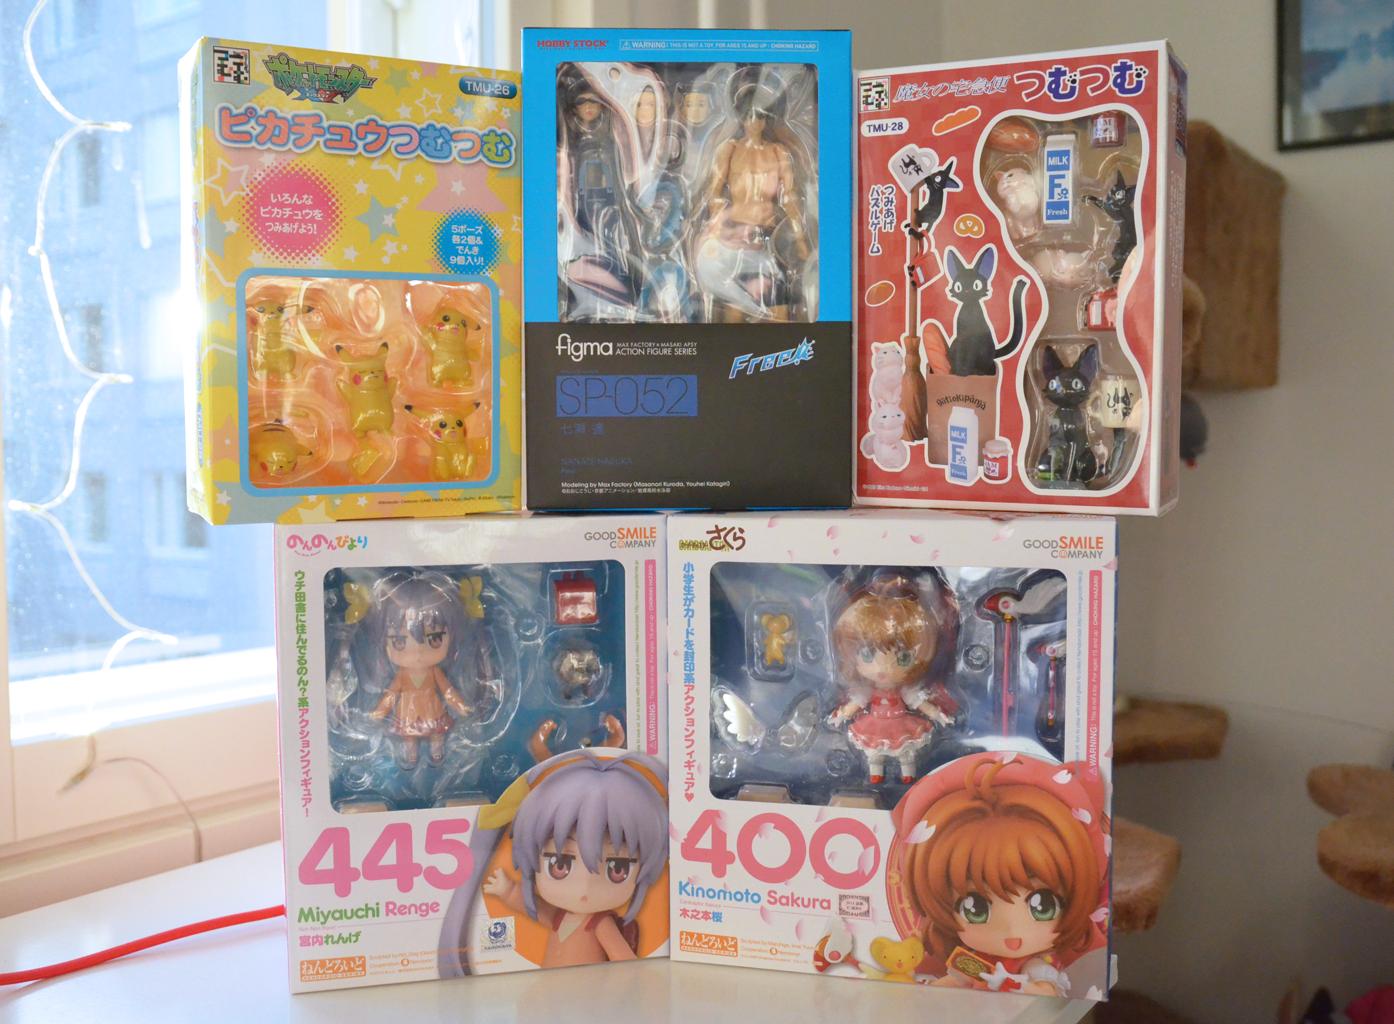 my figures